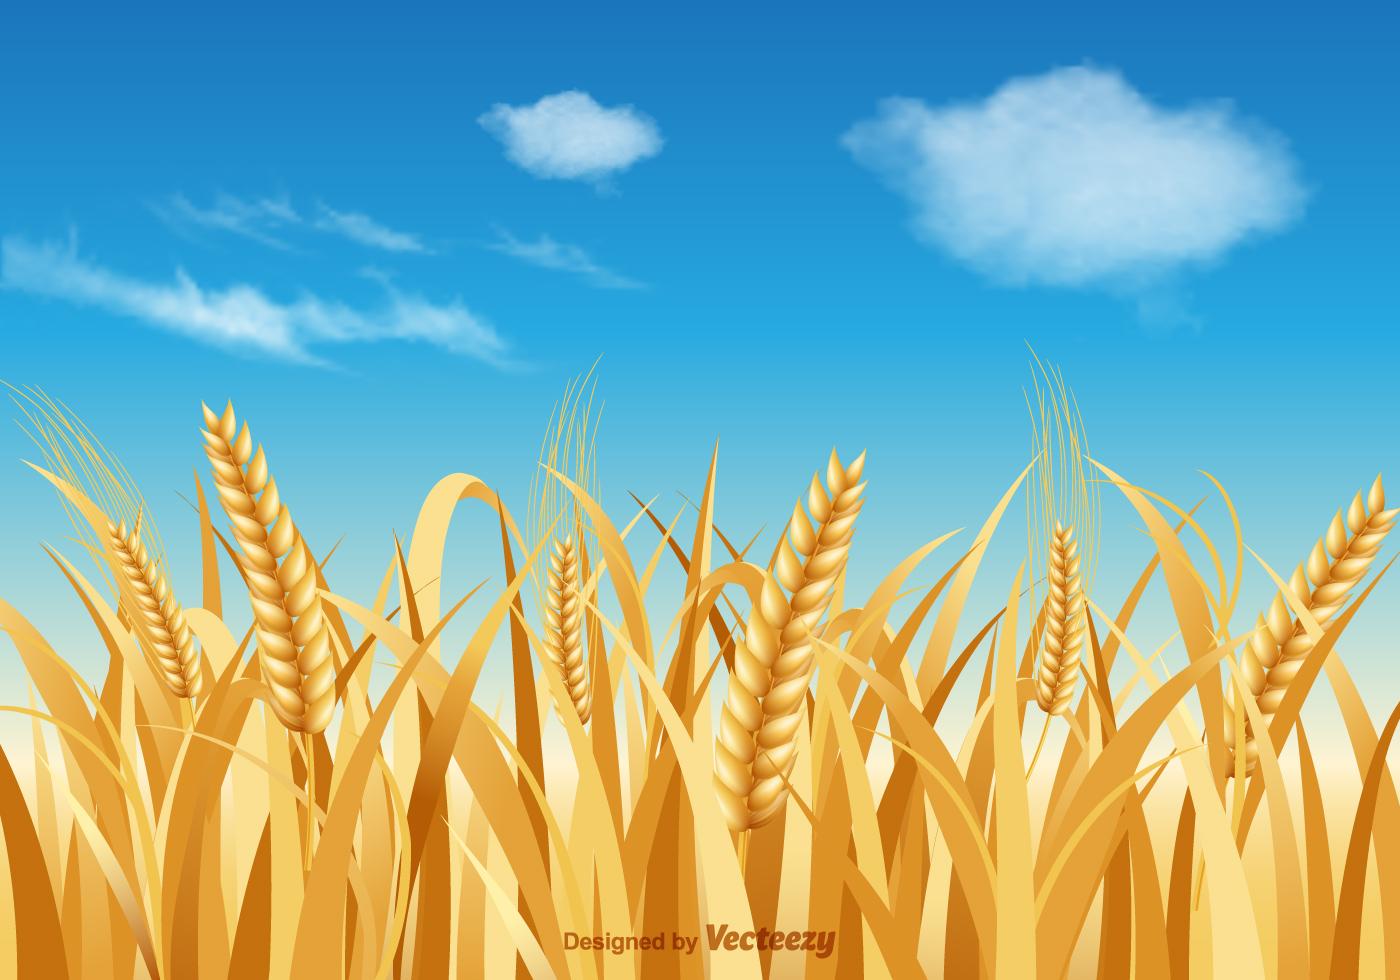 Wheat Stalk Vector Landscape Download Free Vector Art